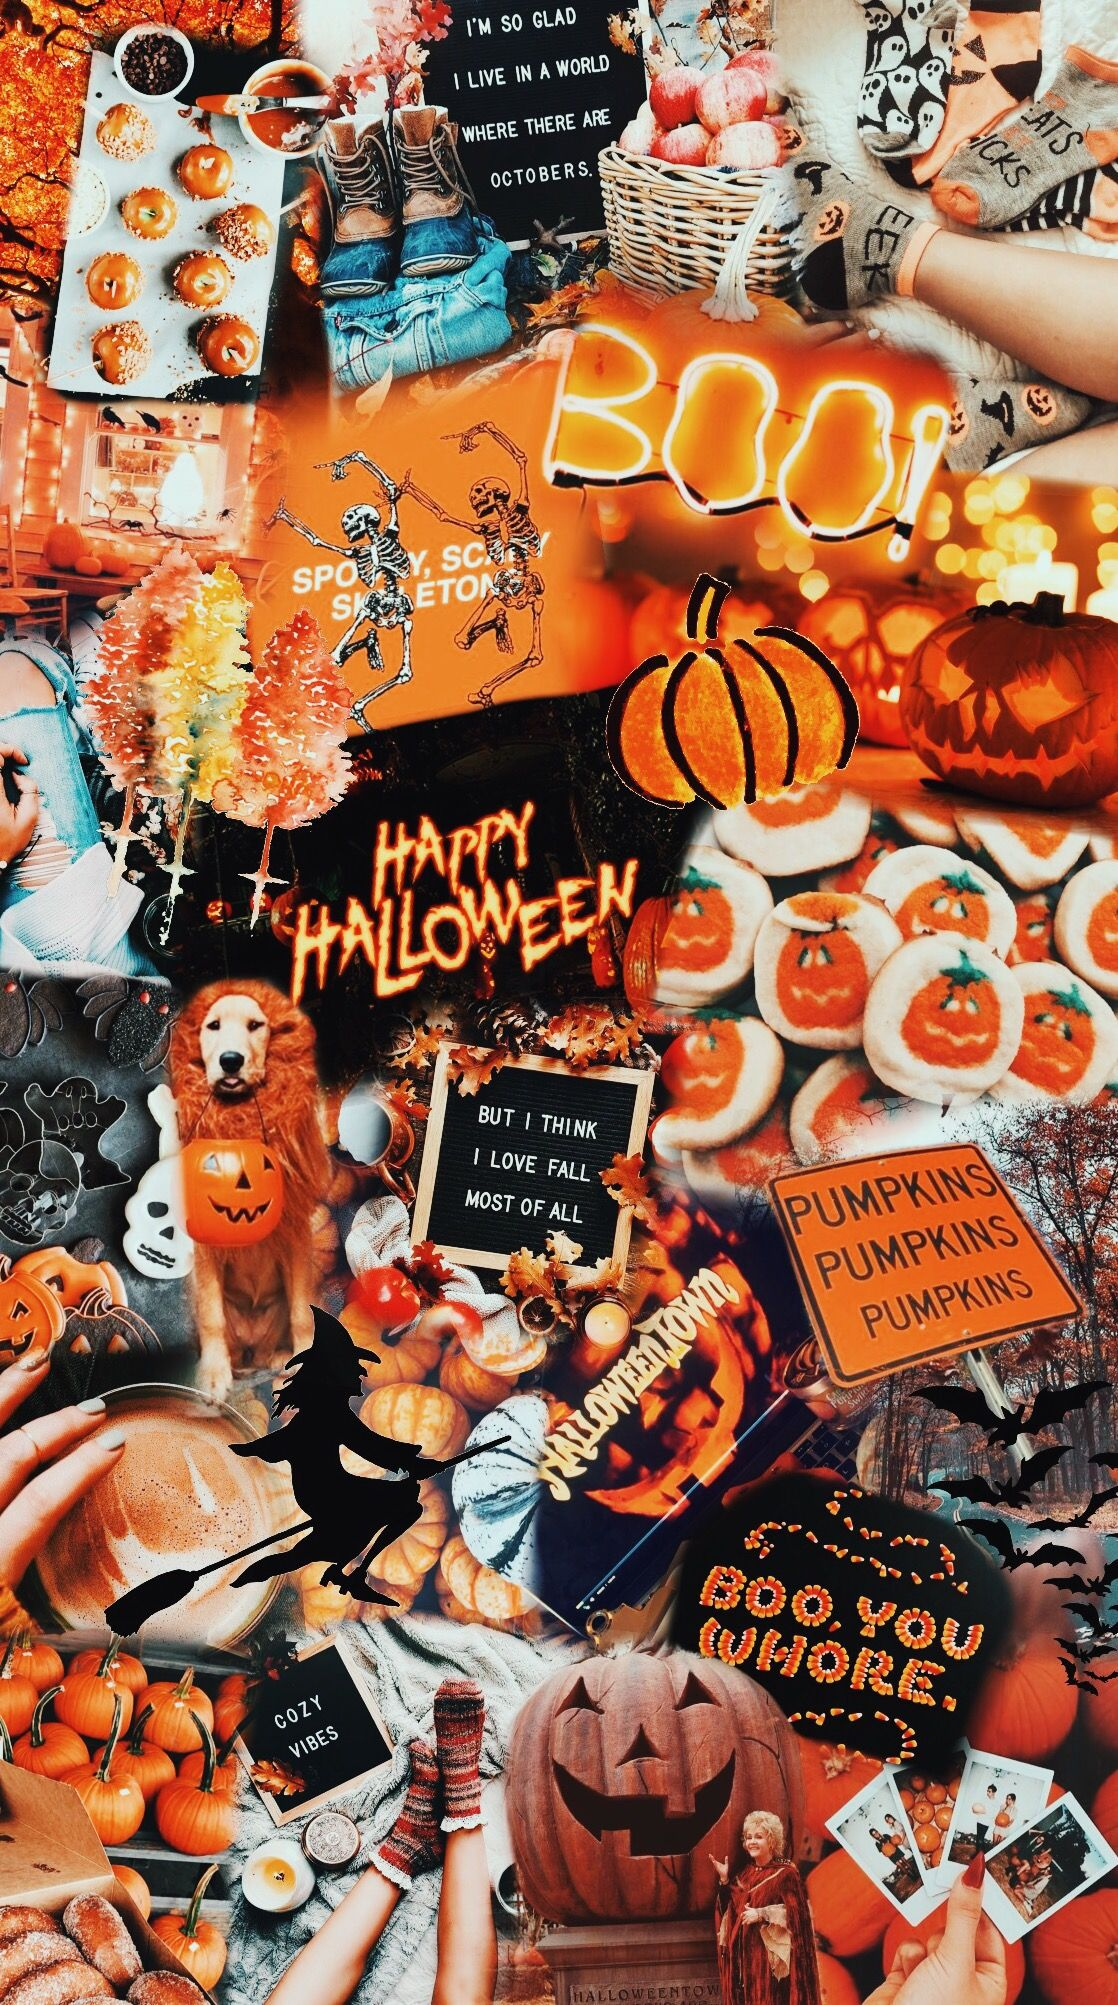 Elspurgeon Vsco Cute Fall Wallpaper Halloween Wallpaper Iphone Halloween Wallpaper Backgrounds